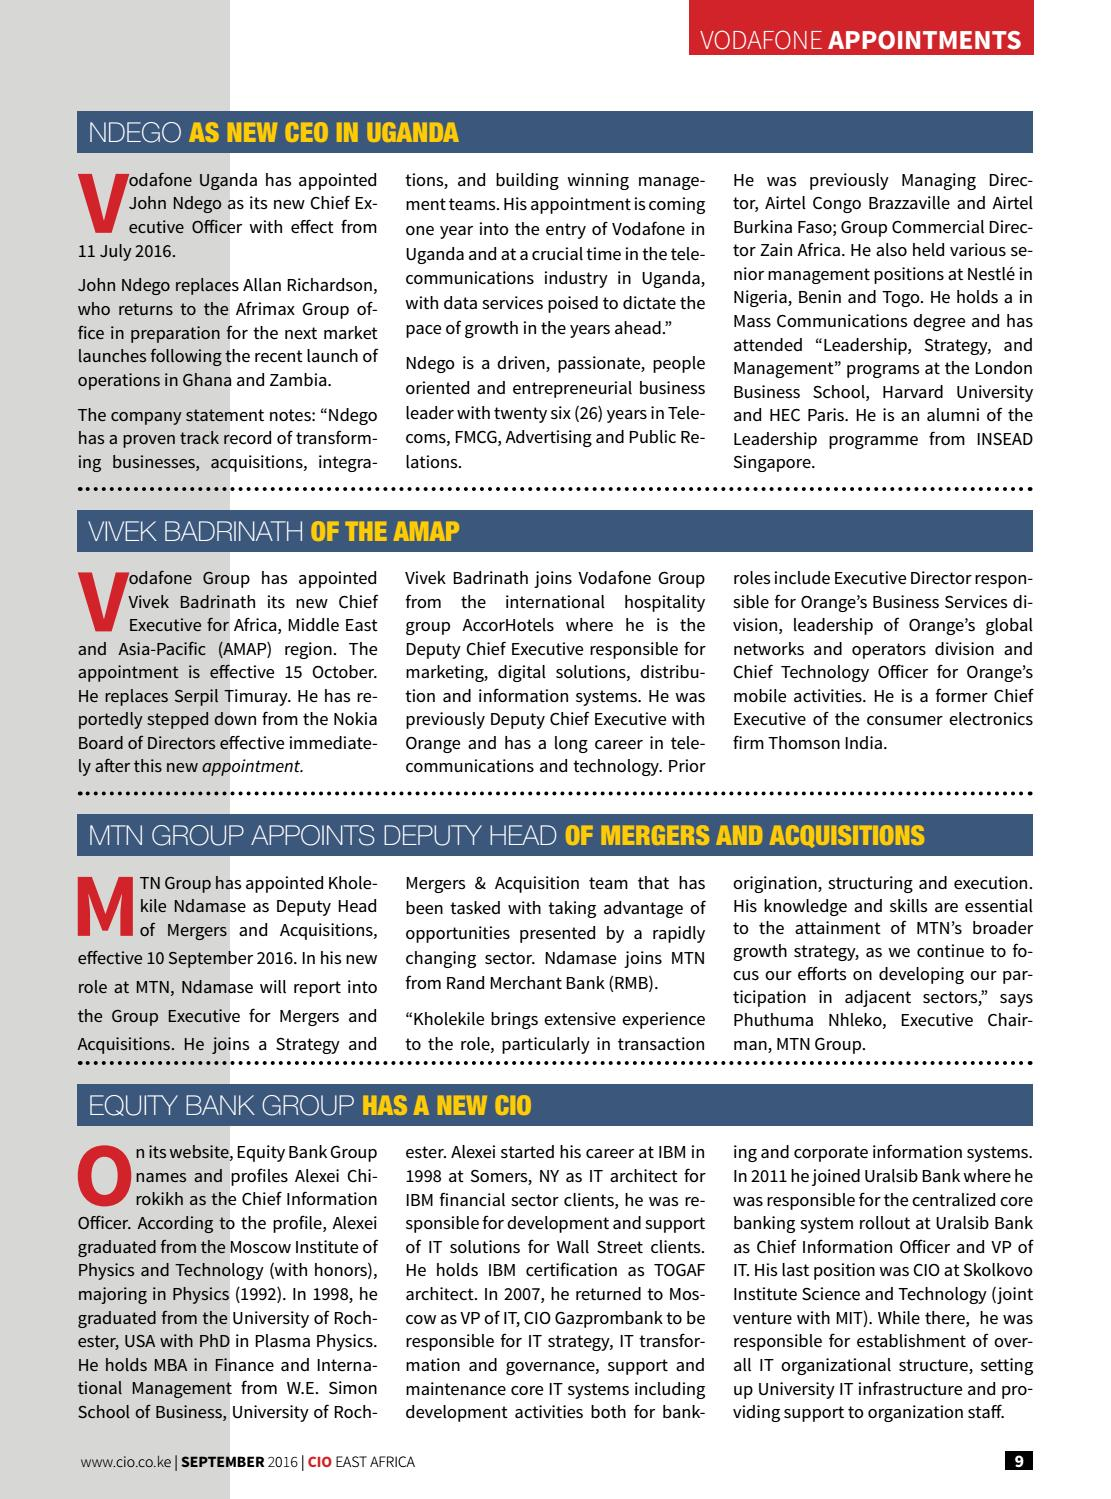 CIO East Africa September 2016 Edition by CIO East Africa - issuu